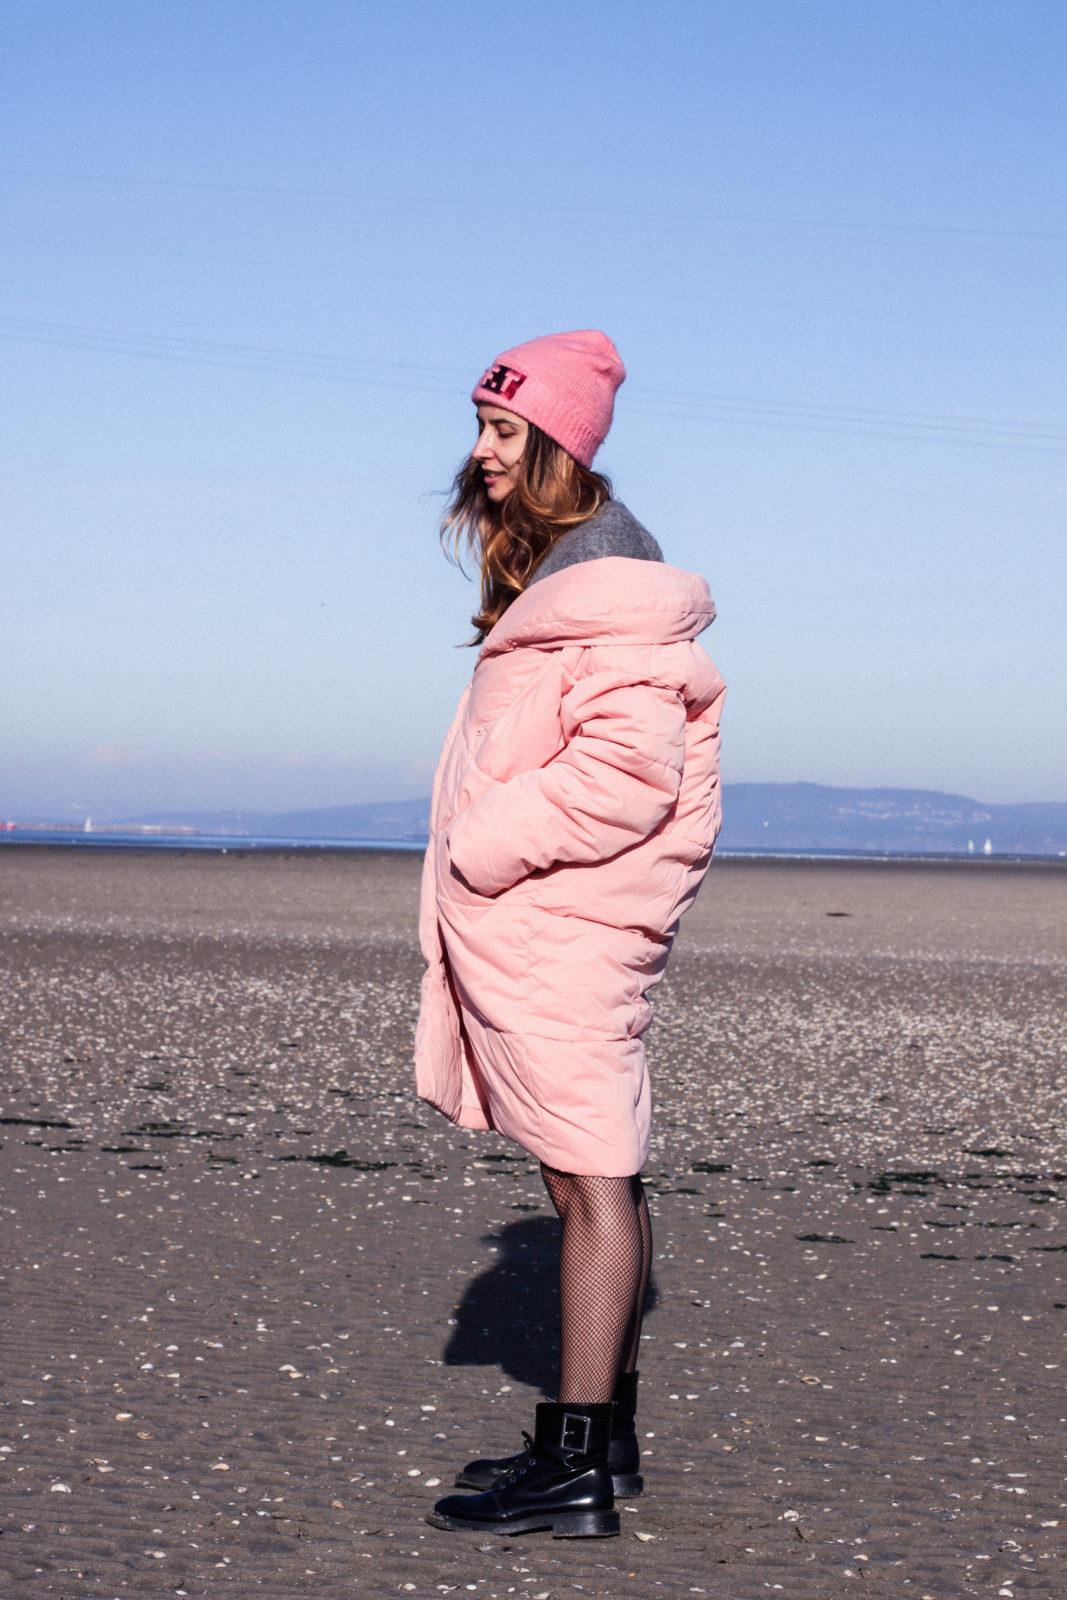 retailmenot-cupones-descuentos-asos-plumifero_rosa-monki-puffer_coat-gorro-beanie-medias_de_rejilla-look-outfit-tendencias-fall-2016-street_style-donkeycool-30